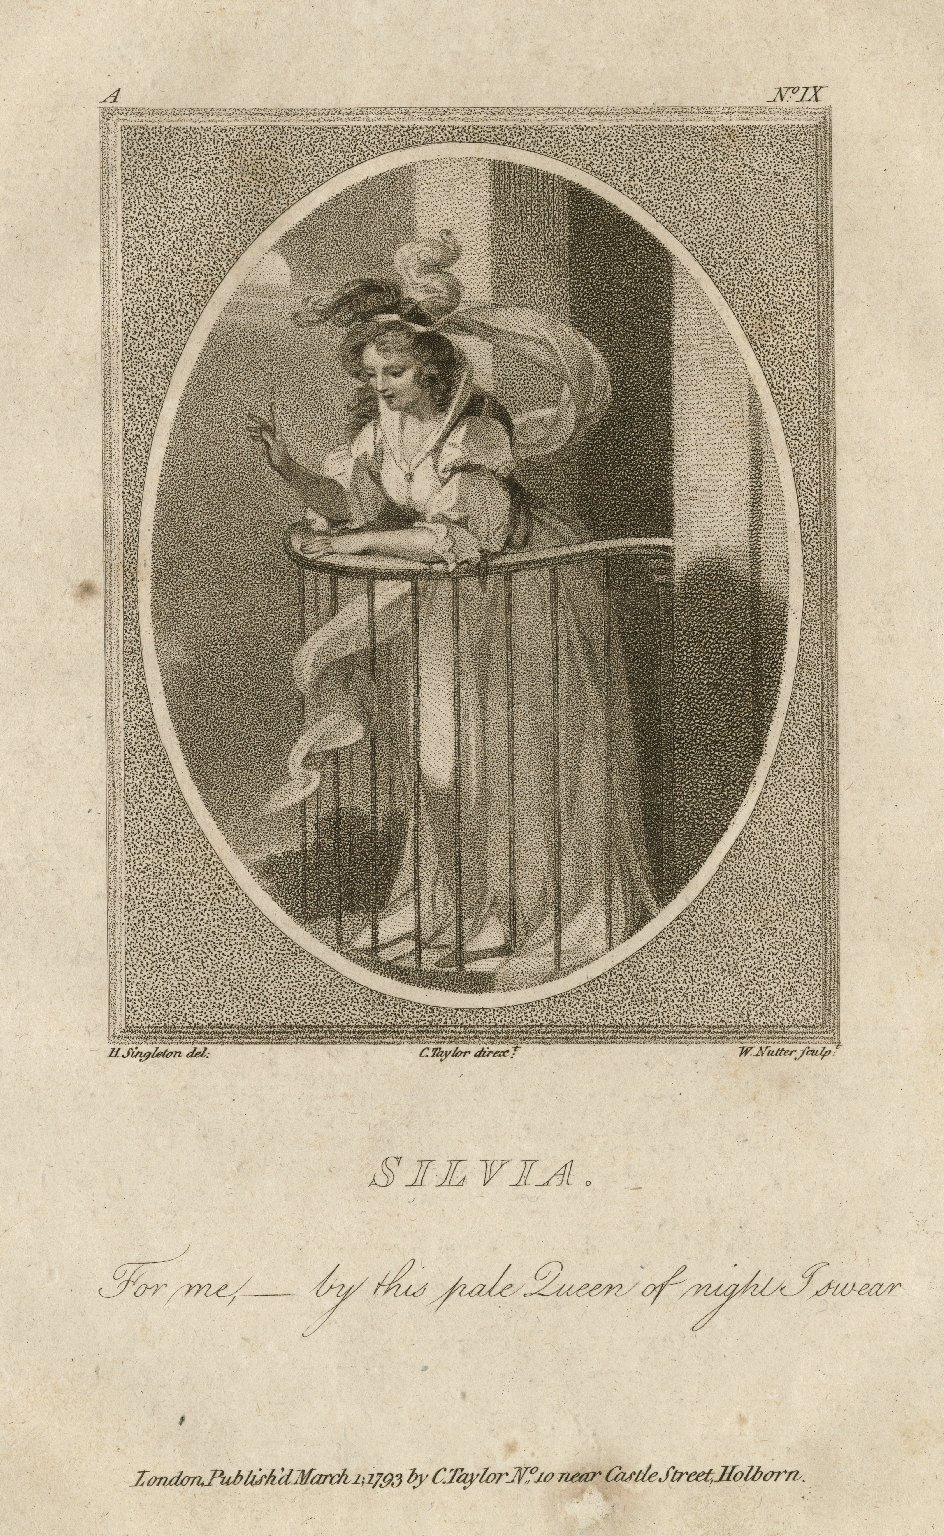 Silvia [character in Two gentlemen of Verona] [graphic] / H. Singleton del. ; C. Taylor dirext. ; W. Nutter sculpt.